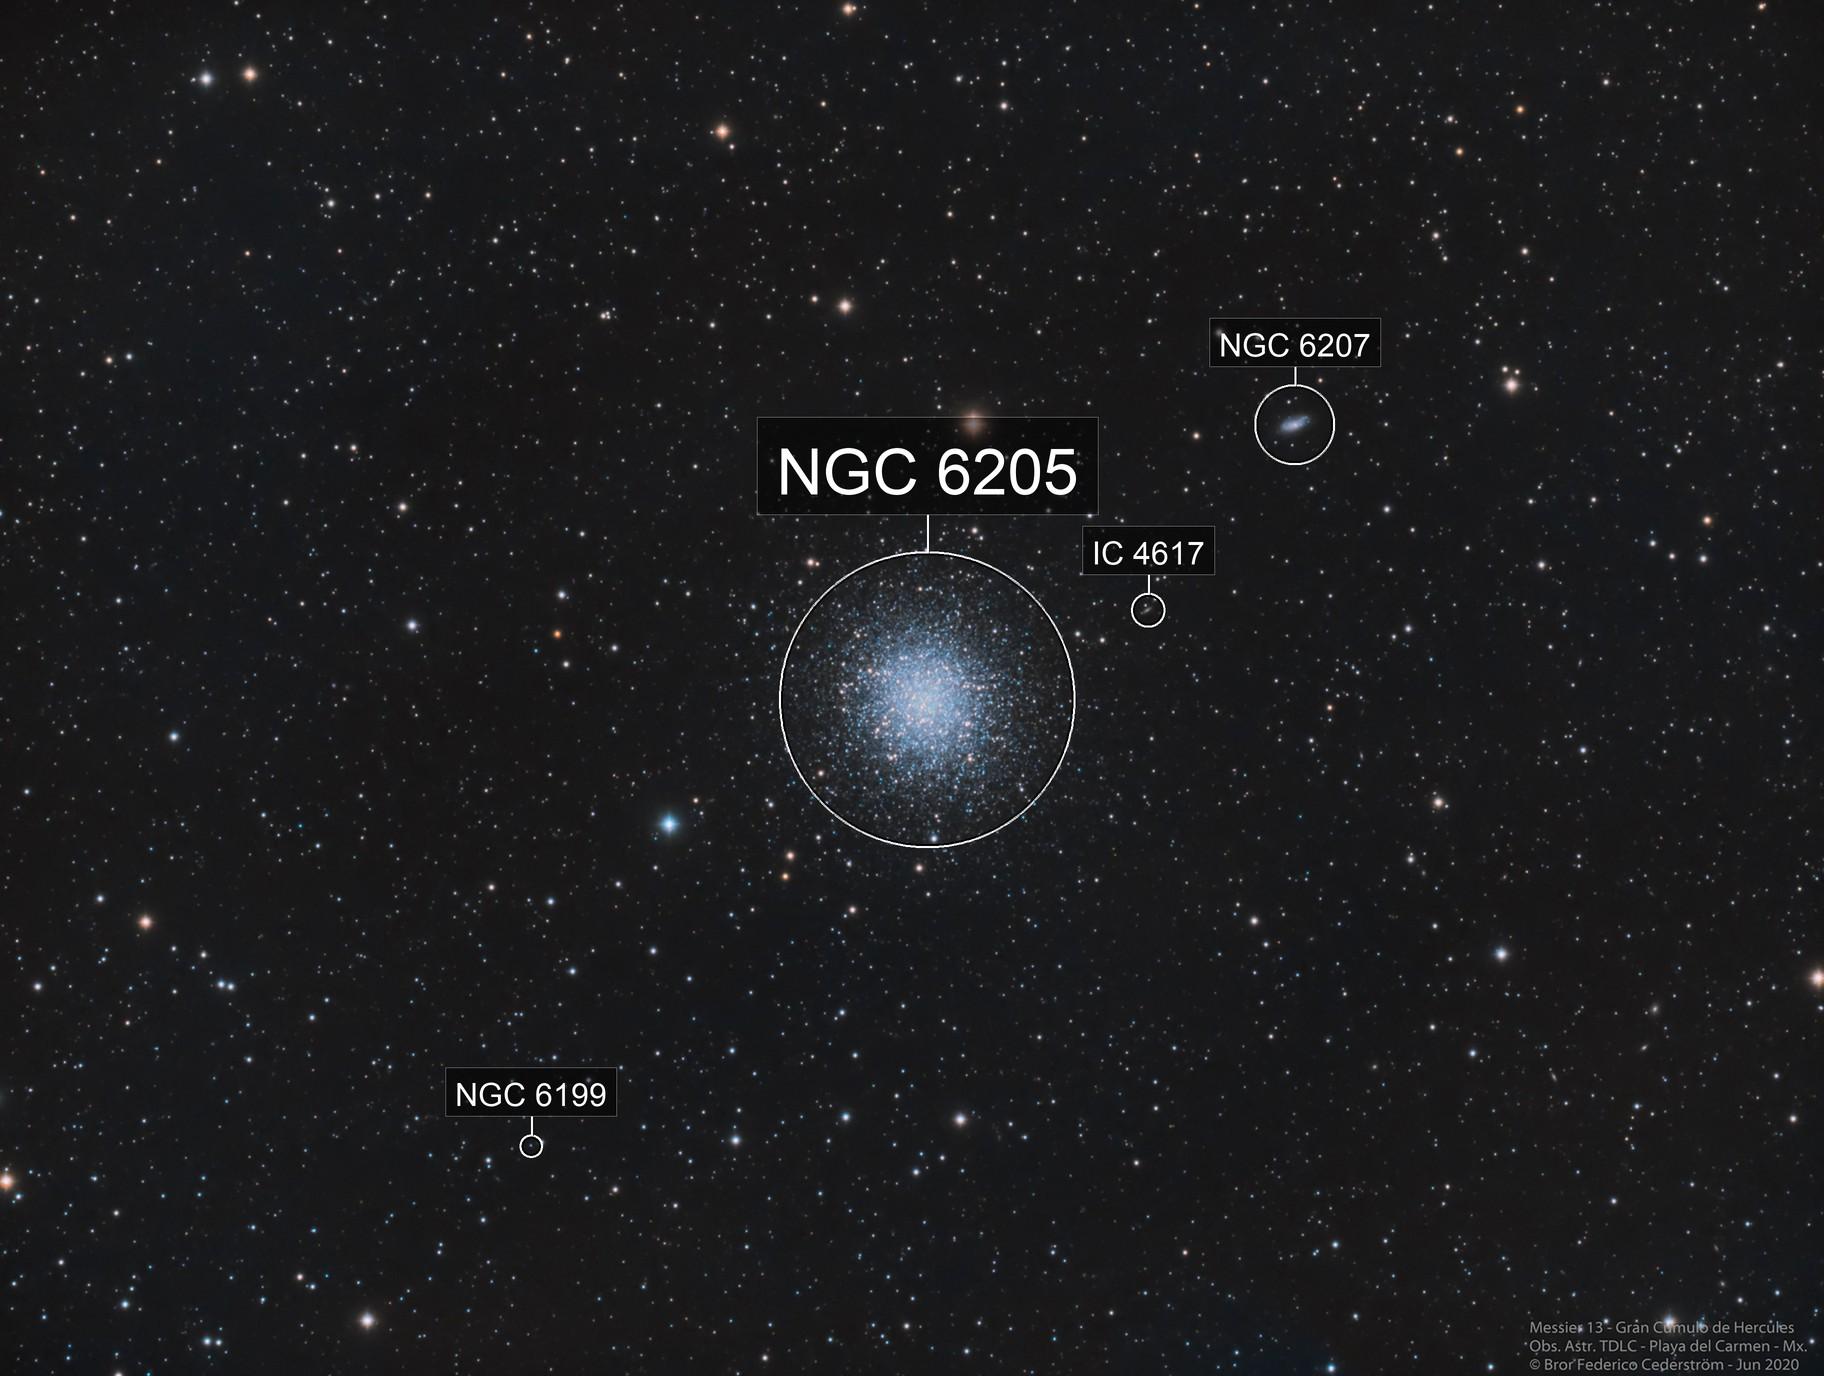 Messier 13 Gran Cúmulo de Hércules